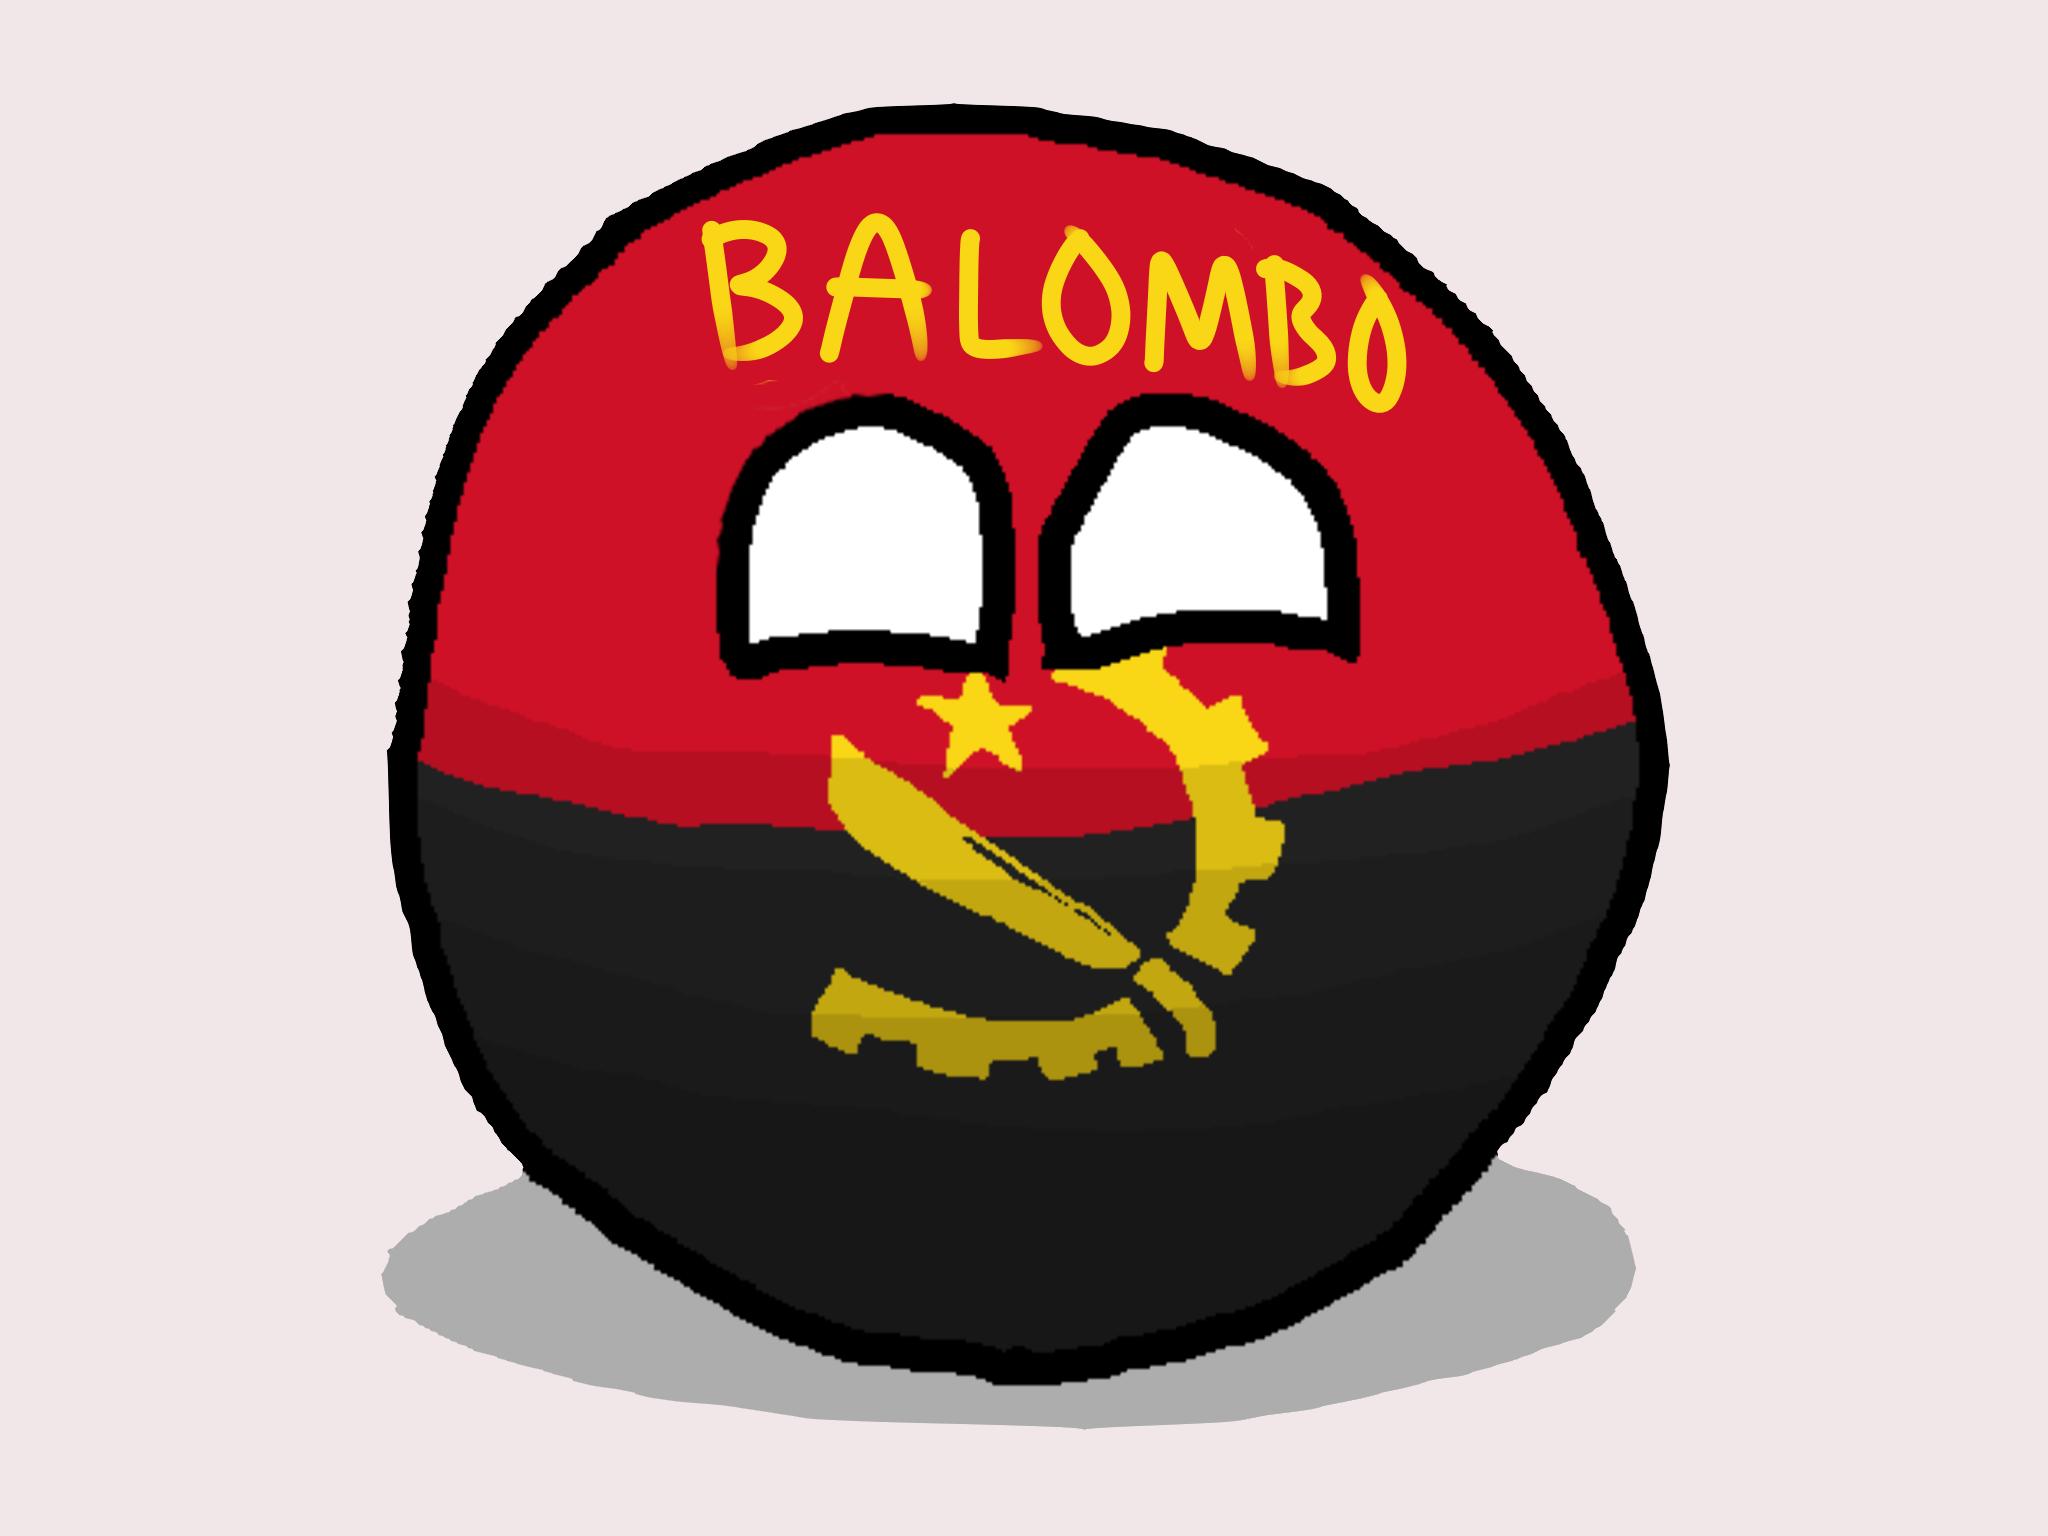 Balomboball